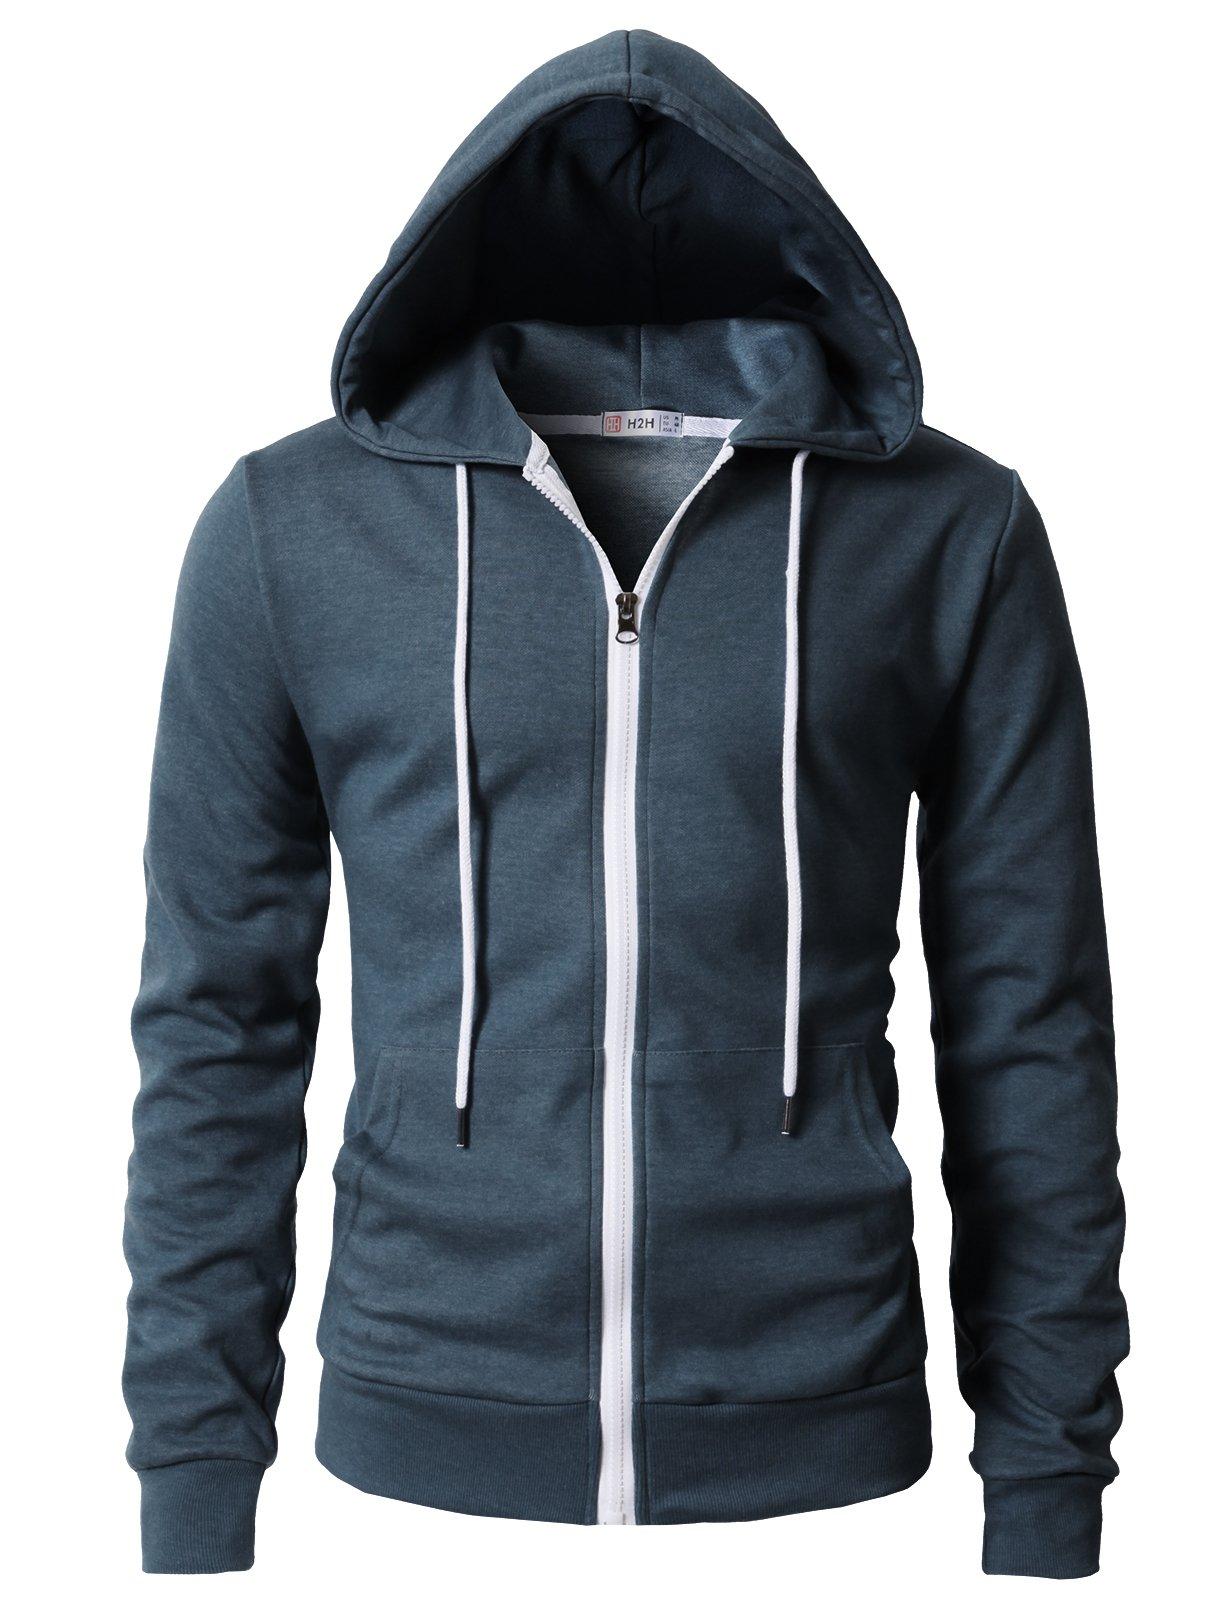 H2H Men's Casual Fit Long Sleeve Lightweight Zip up Pullover Hoodie Sweatshirt with Kanga Pocket DARKBLUE US L/Asia XL (KMOHOL0131)